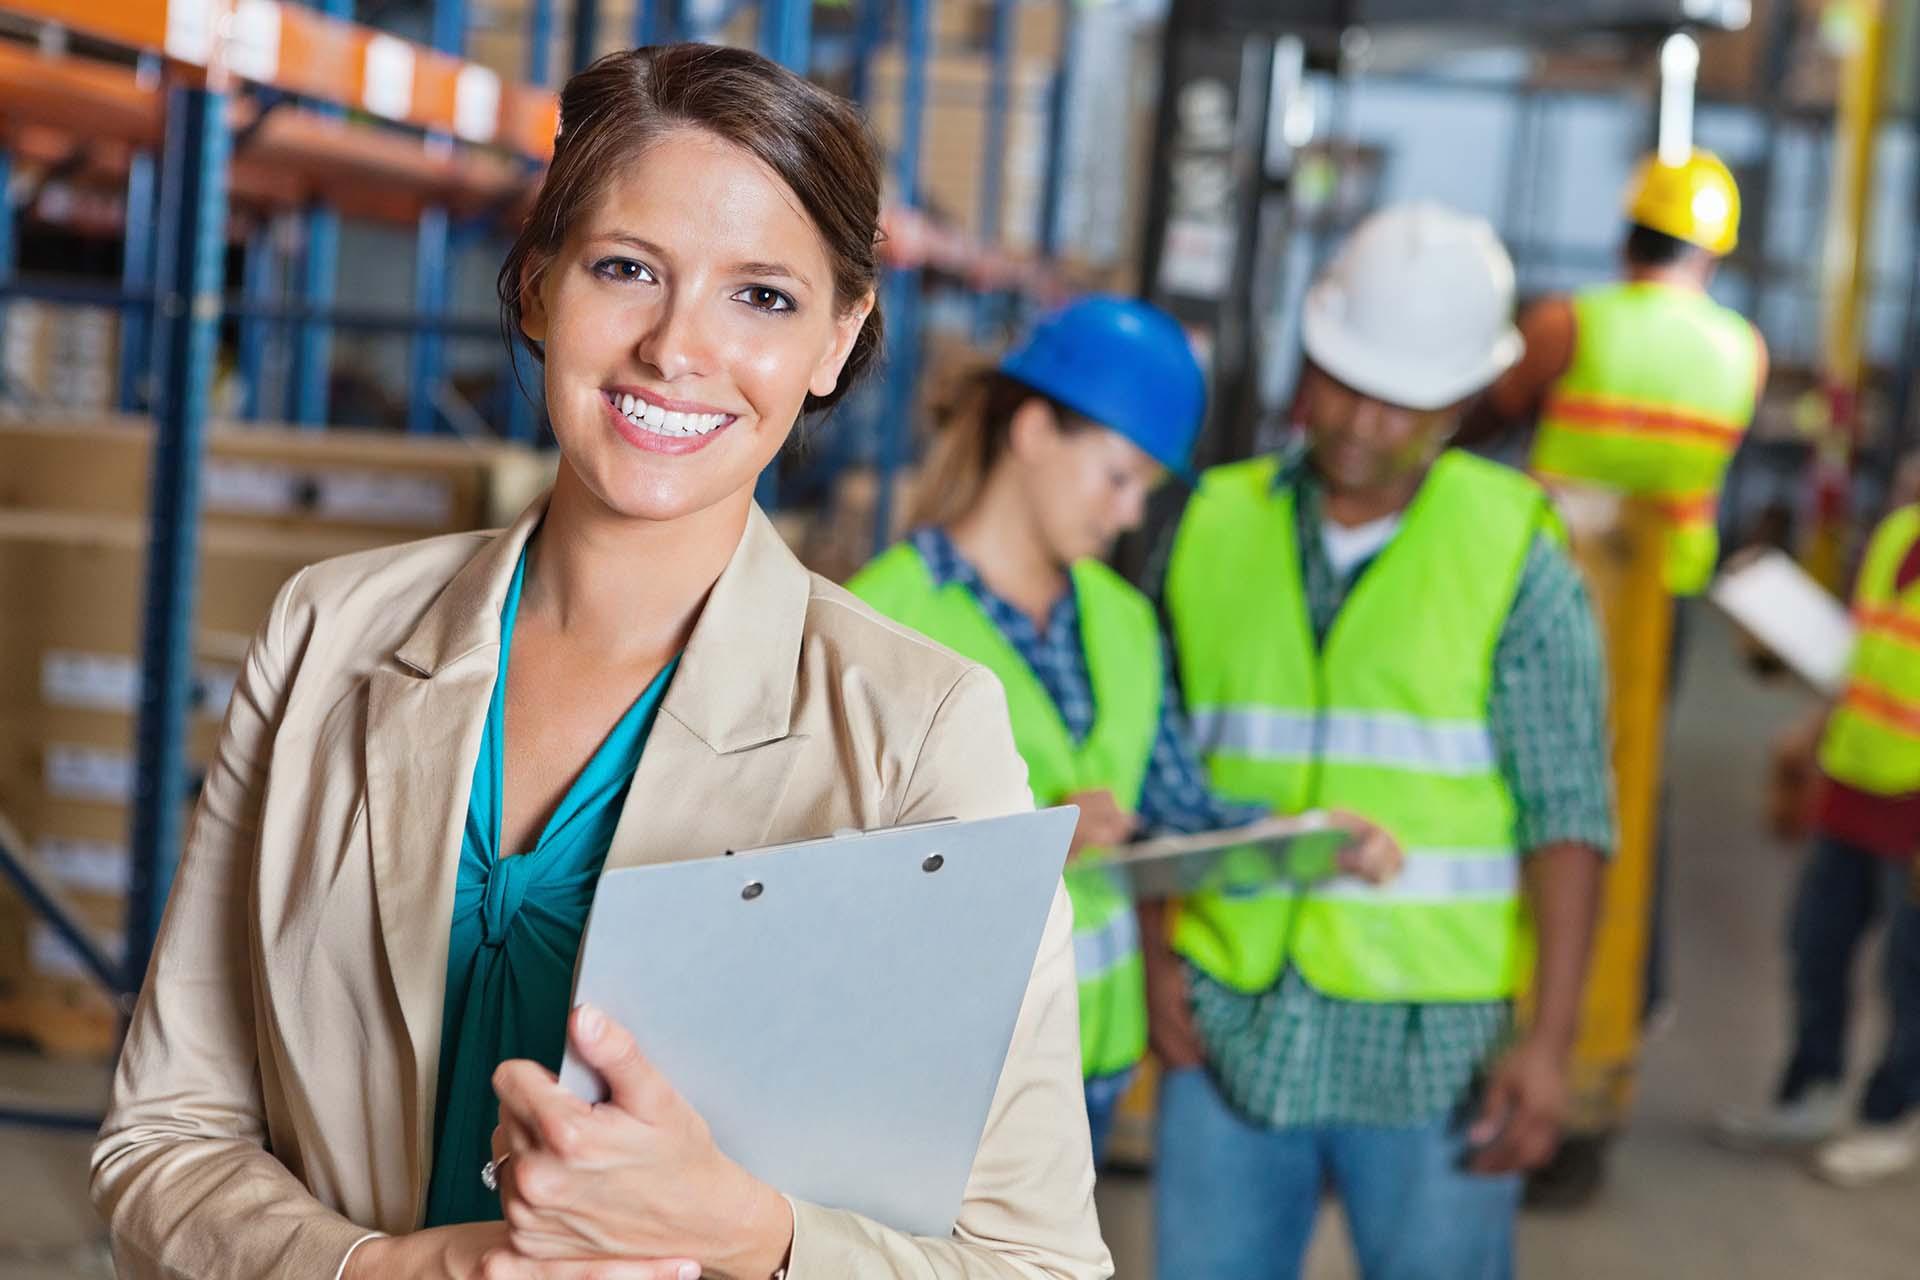 Certified Logistics Technician